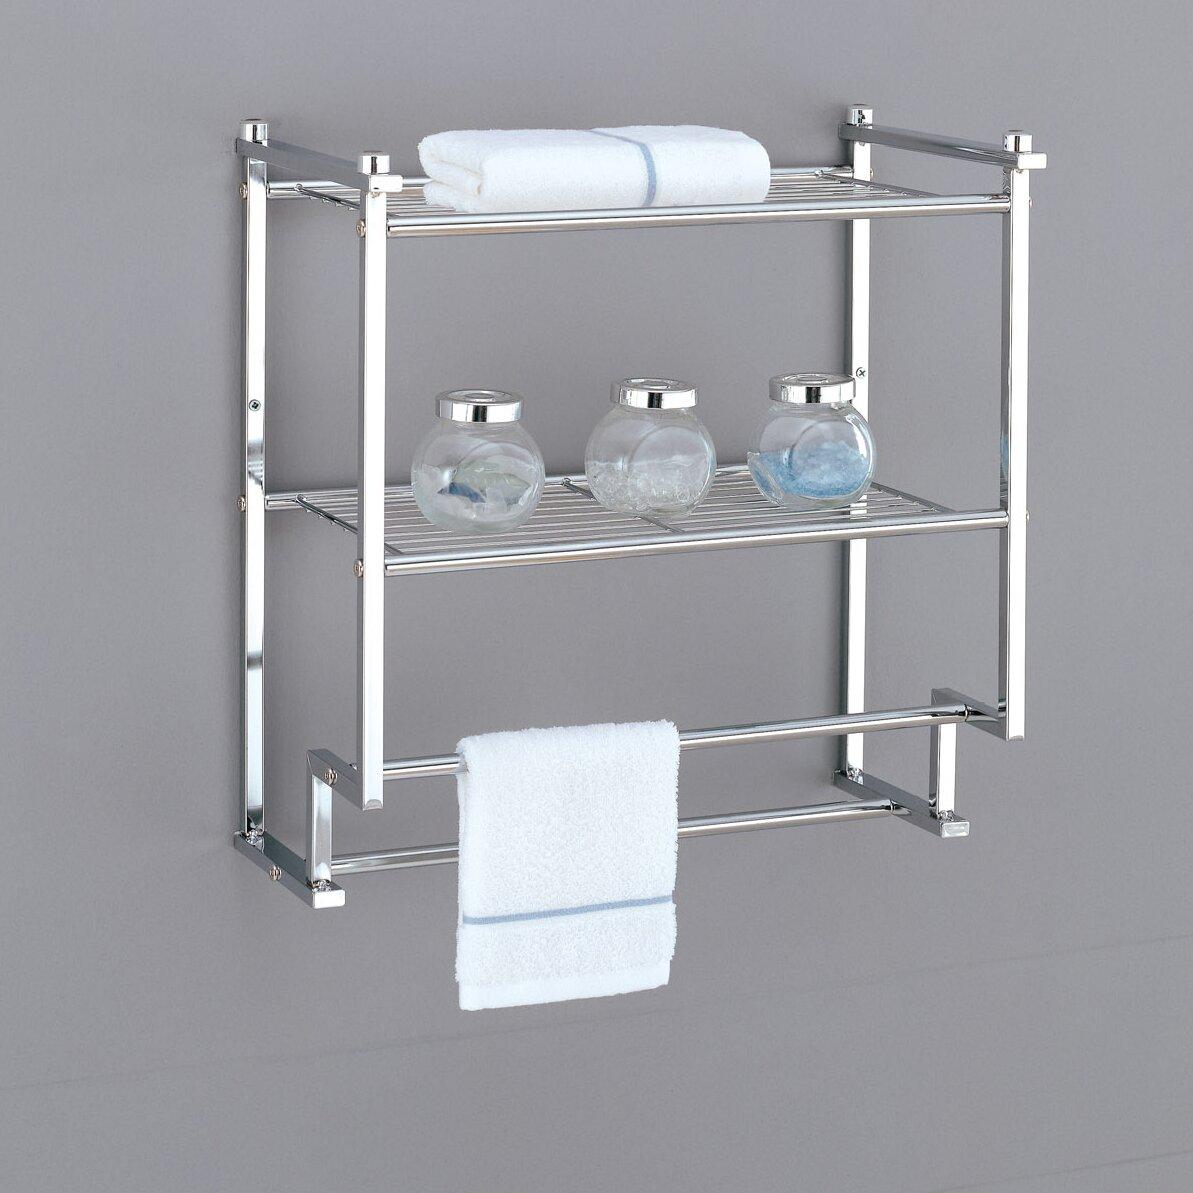 oia metro wall mounted towel rack reviews wayfair. Black Bedroom Furniture Sets. Home Design Ideas